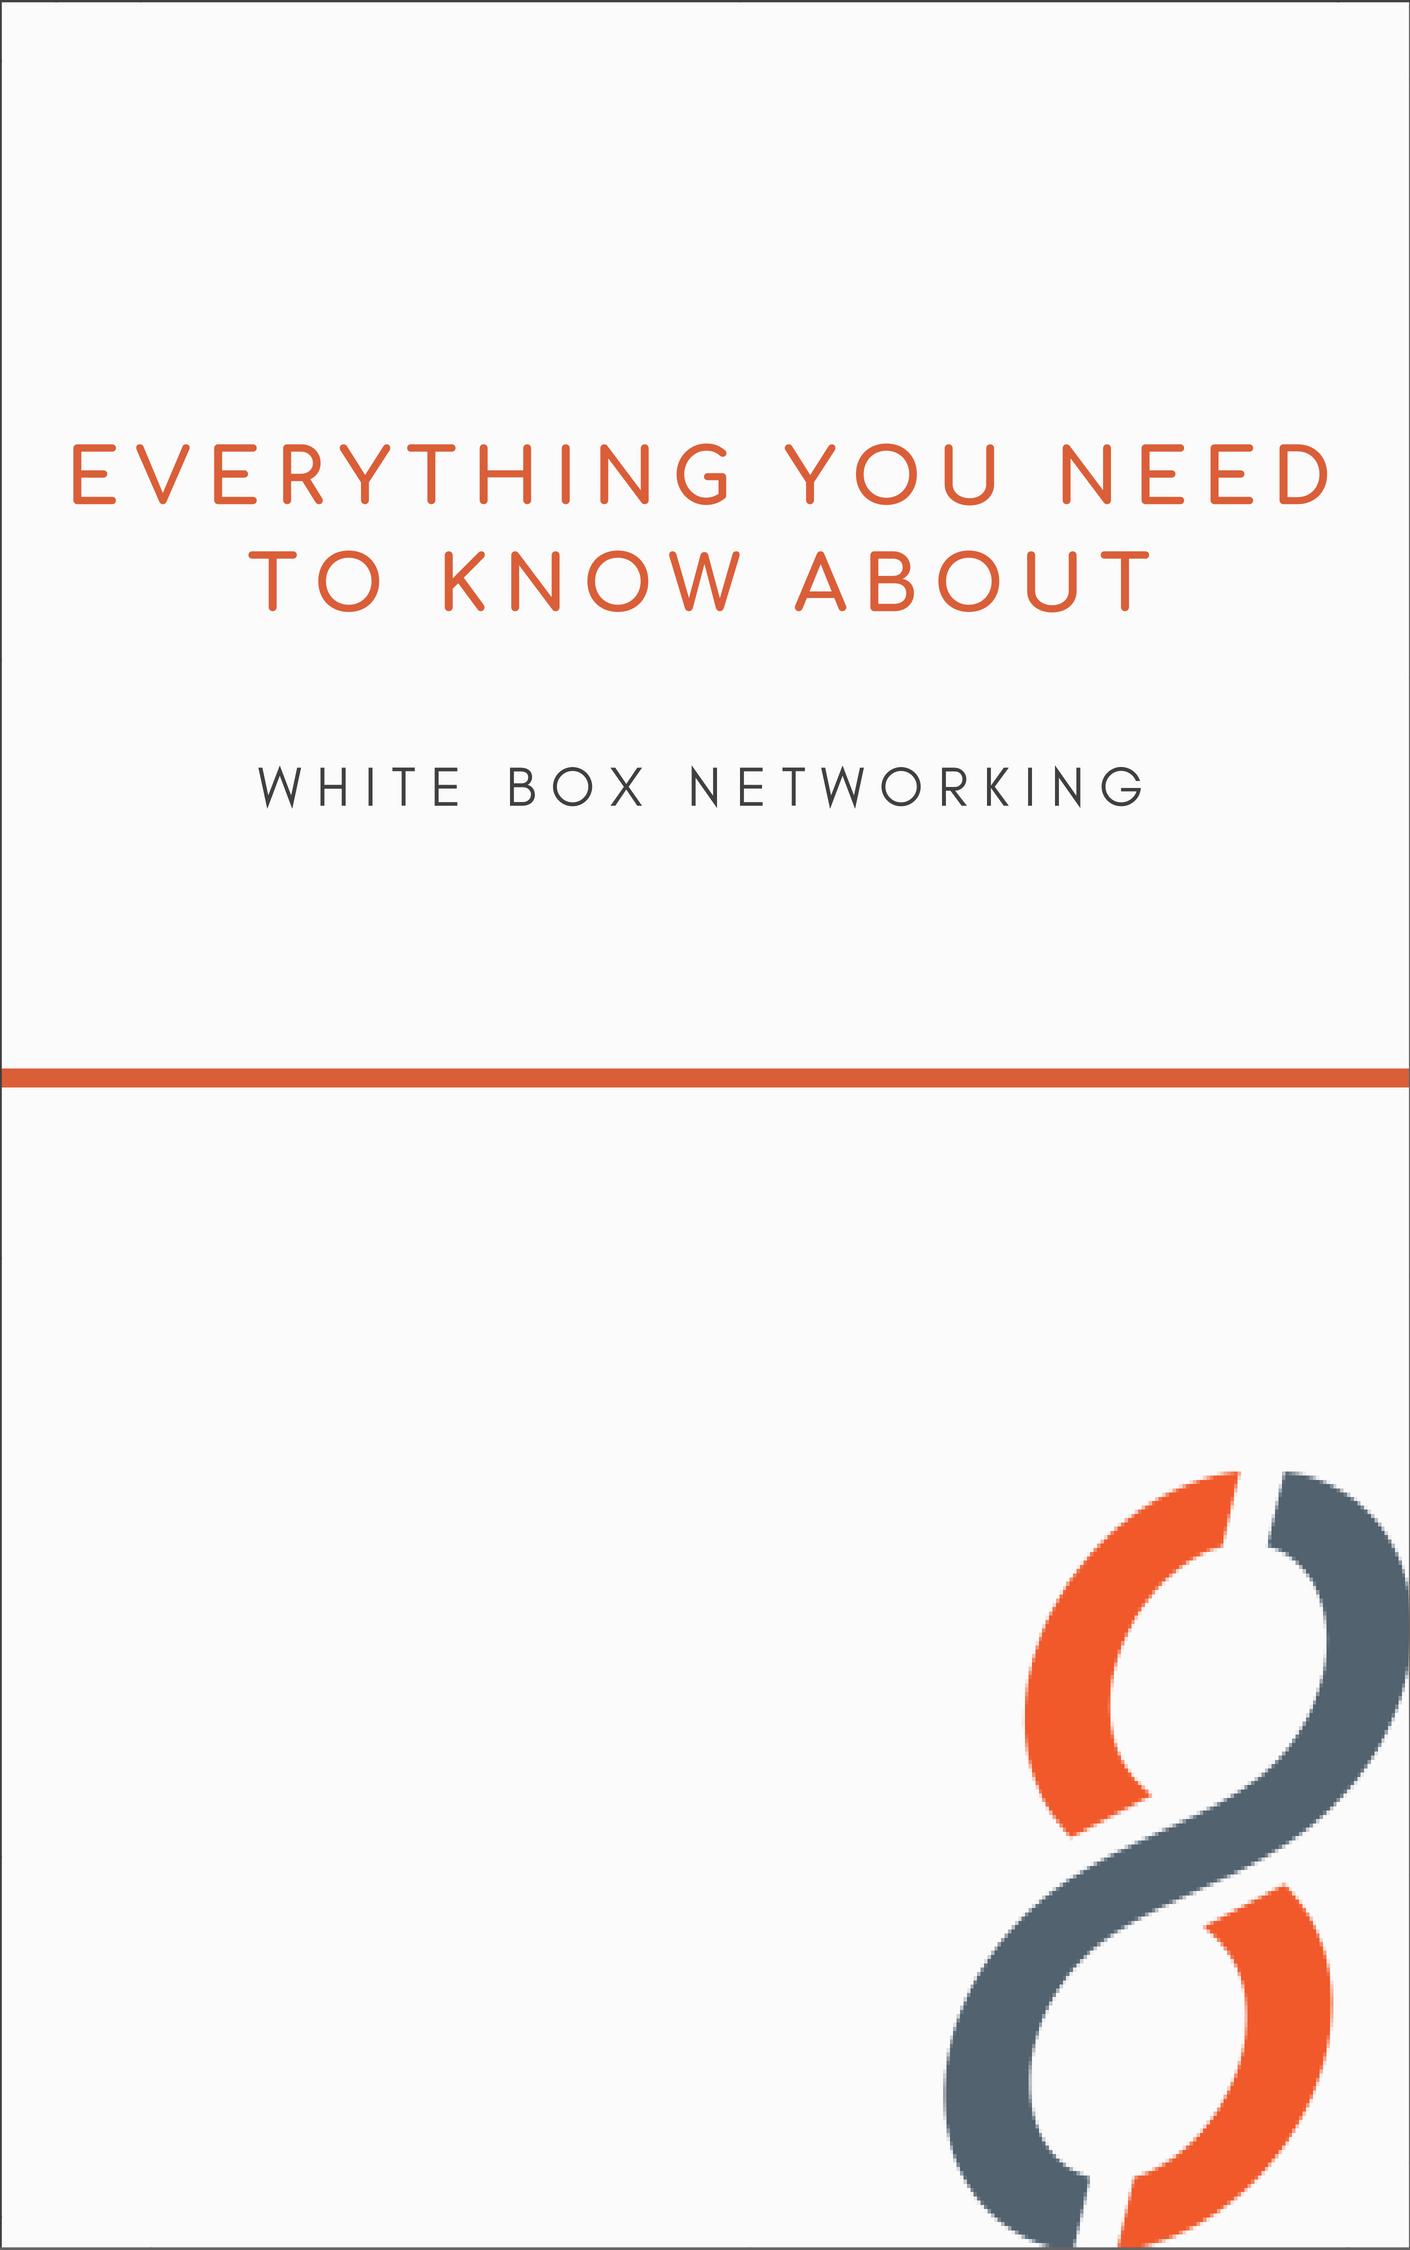 White Box Networking_Image (1)